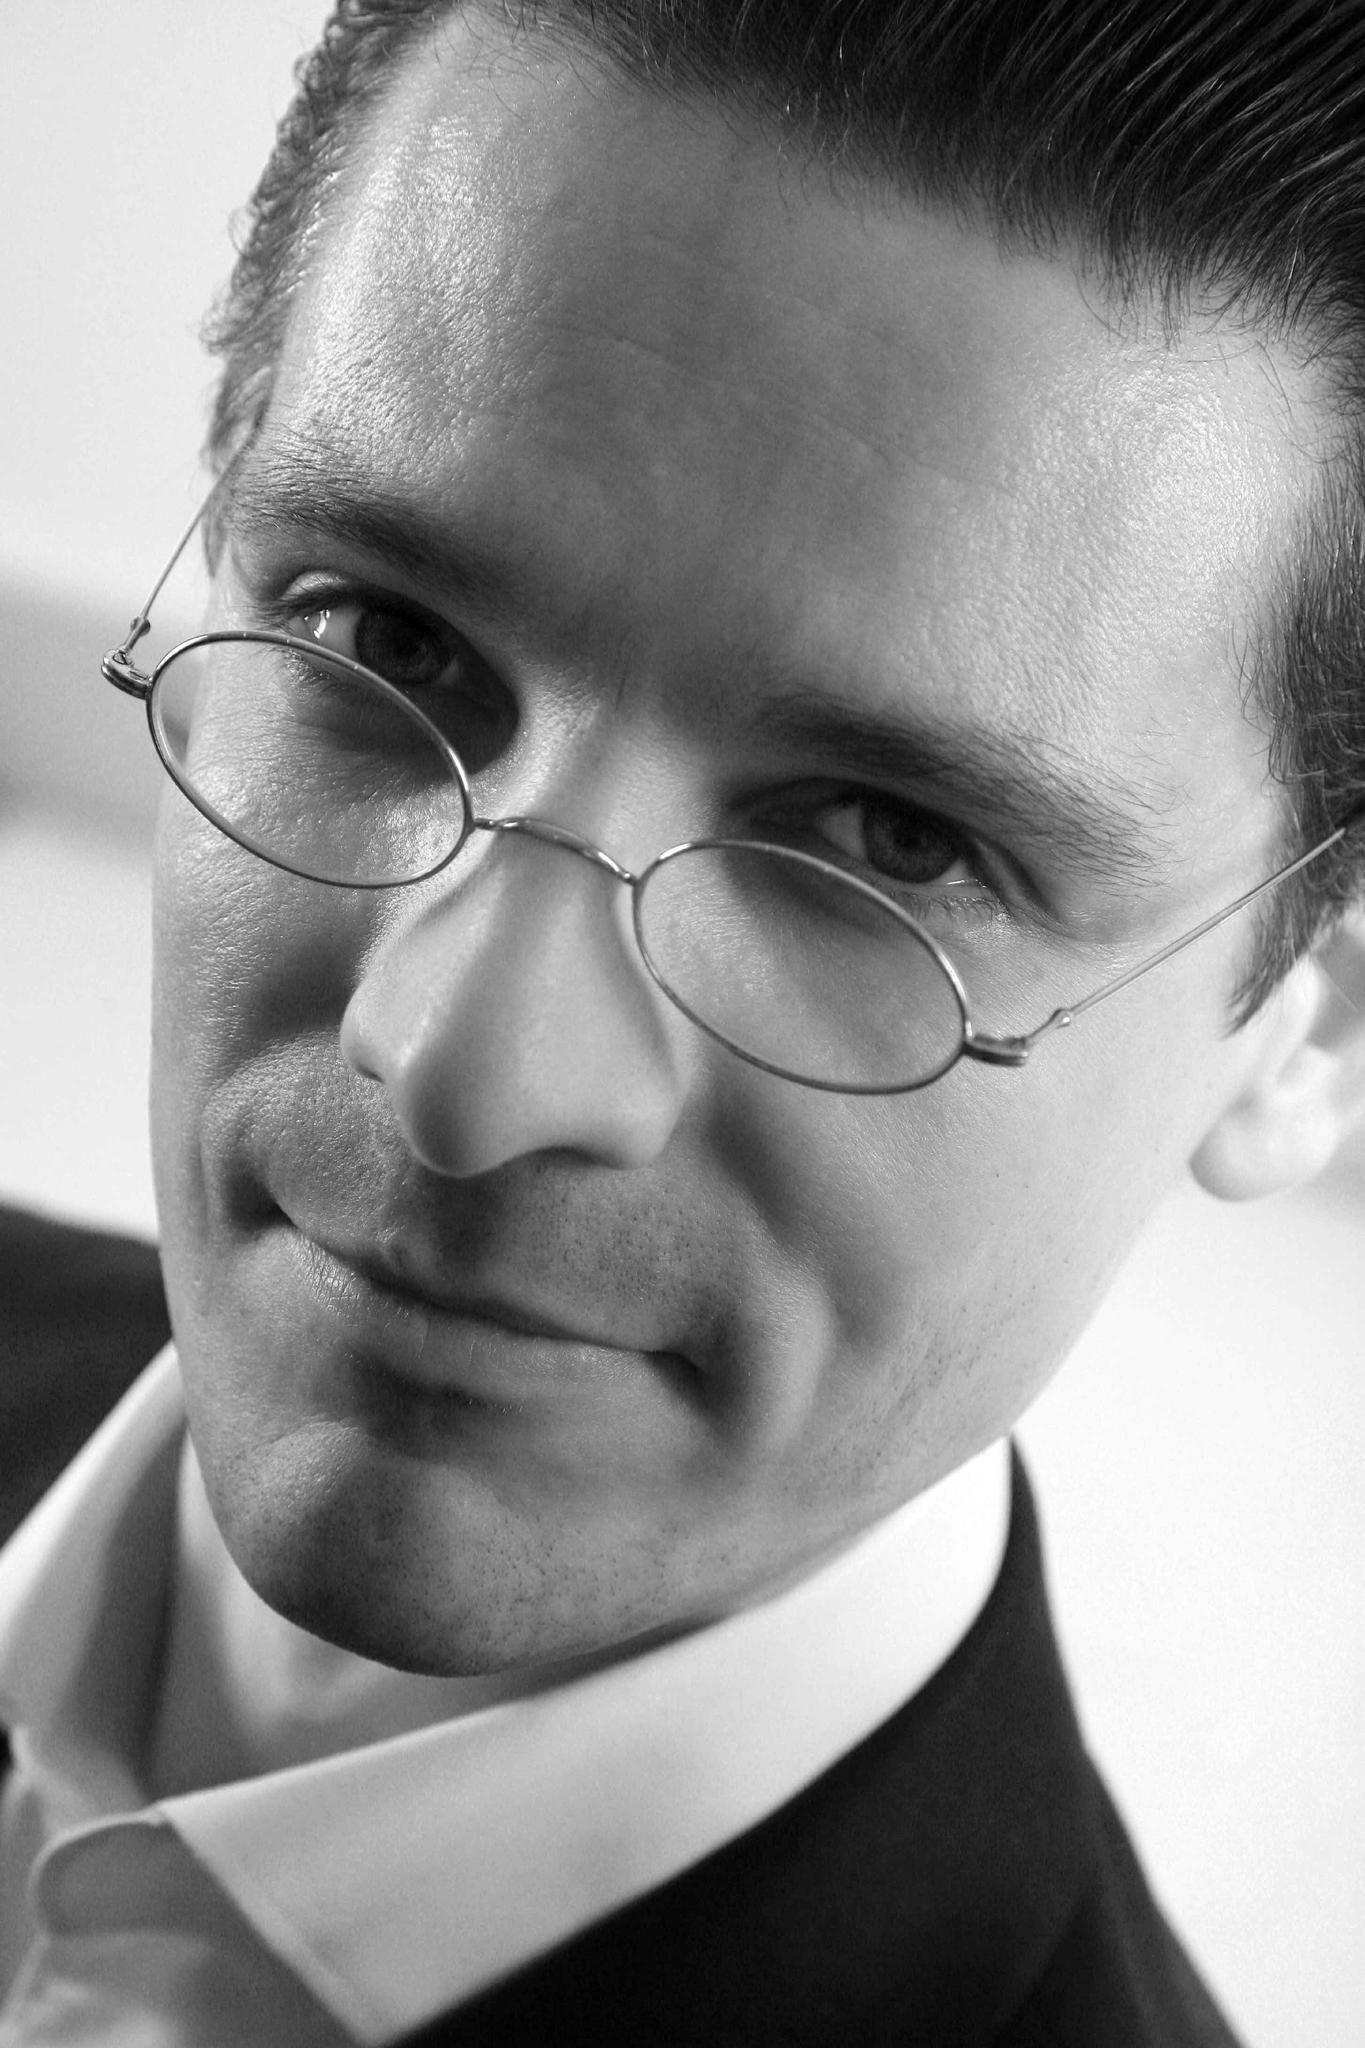 Marc-Antoine Ledieu